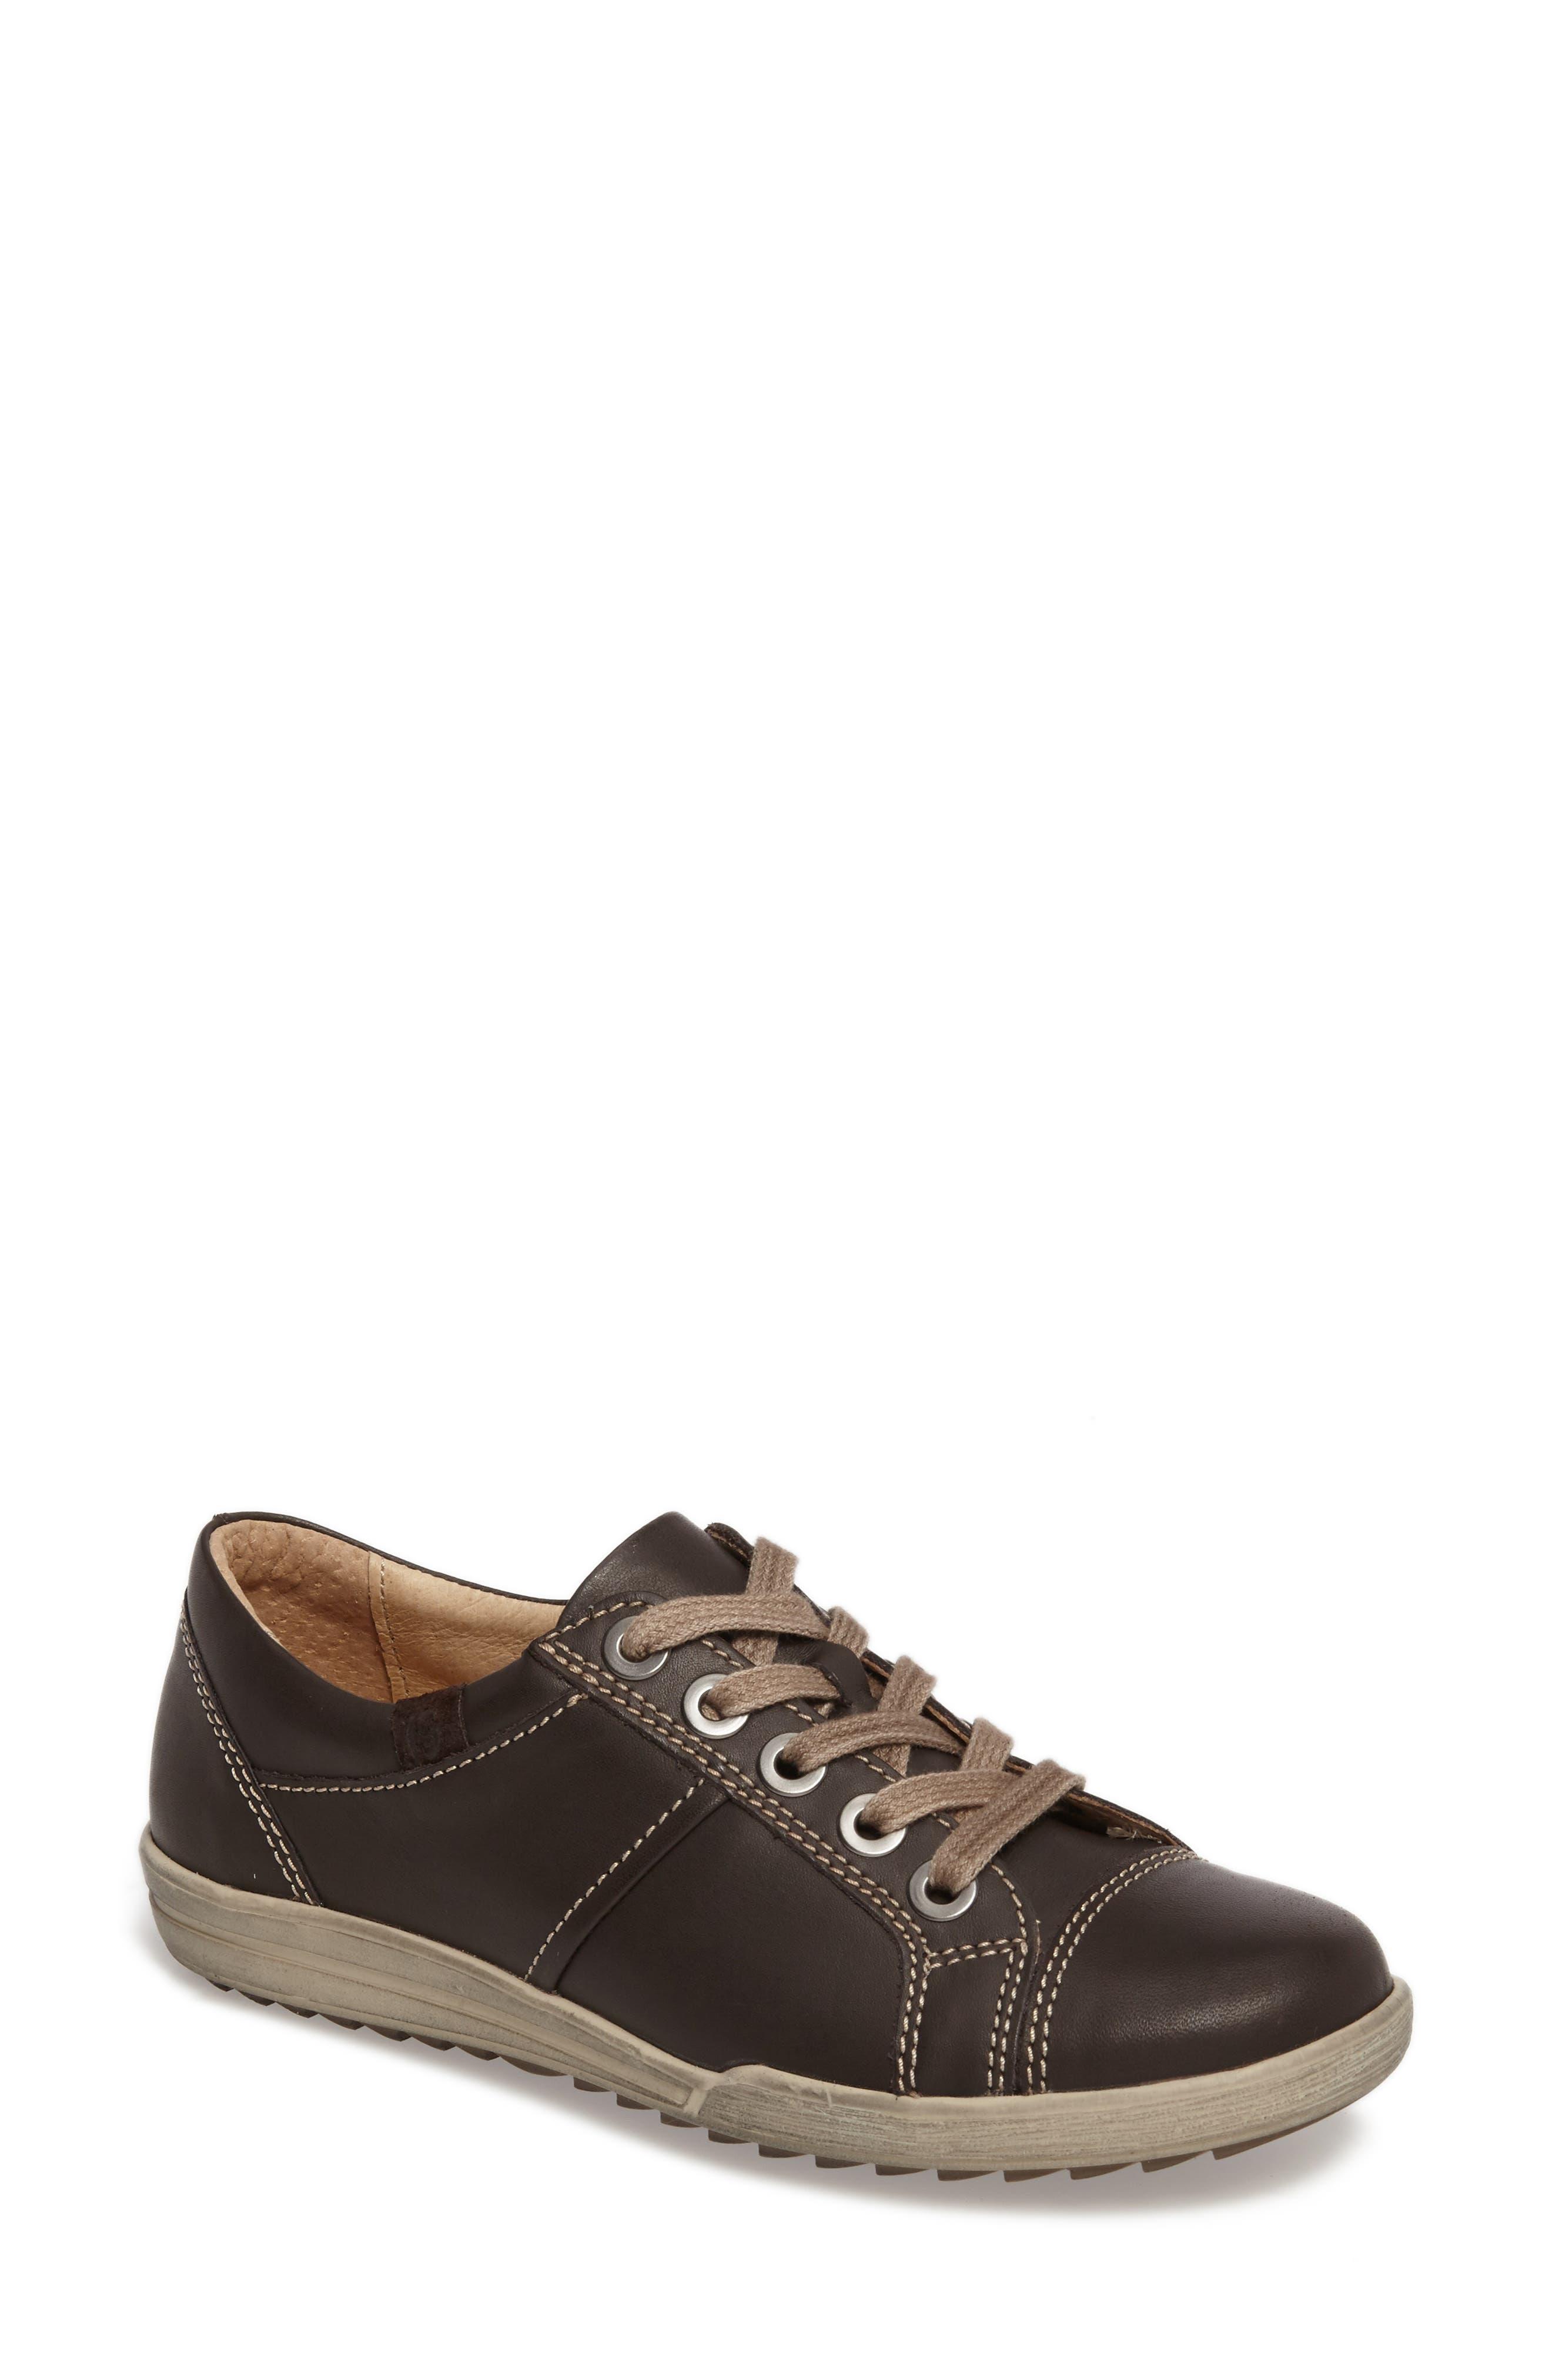 Dany 59 Sneaker,                             Main thumbnail 1, color,                             Moro Leather